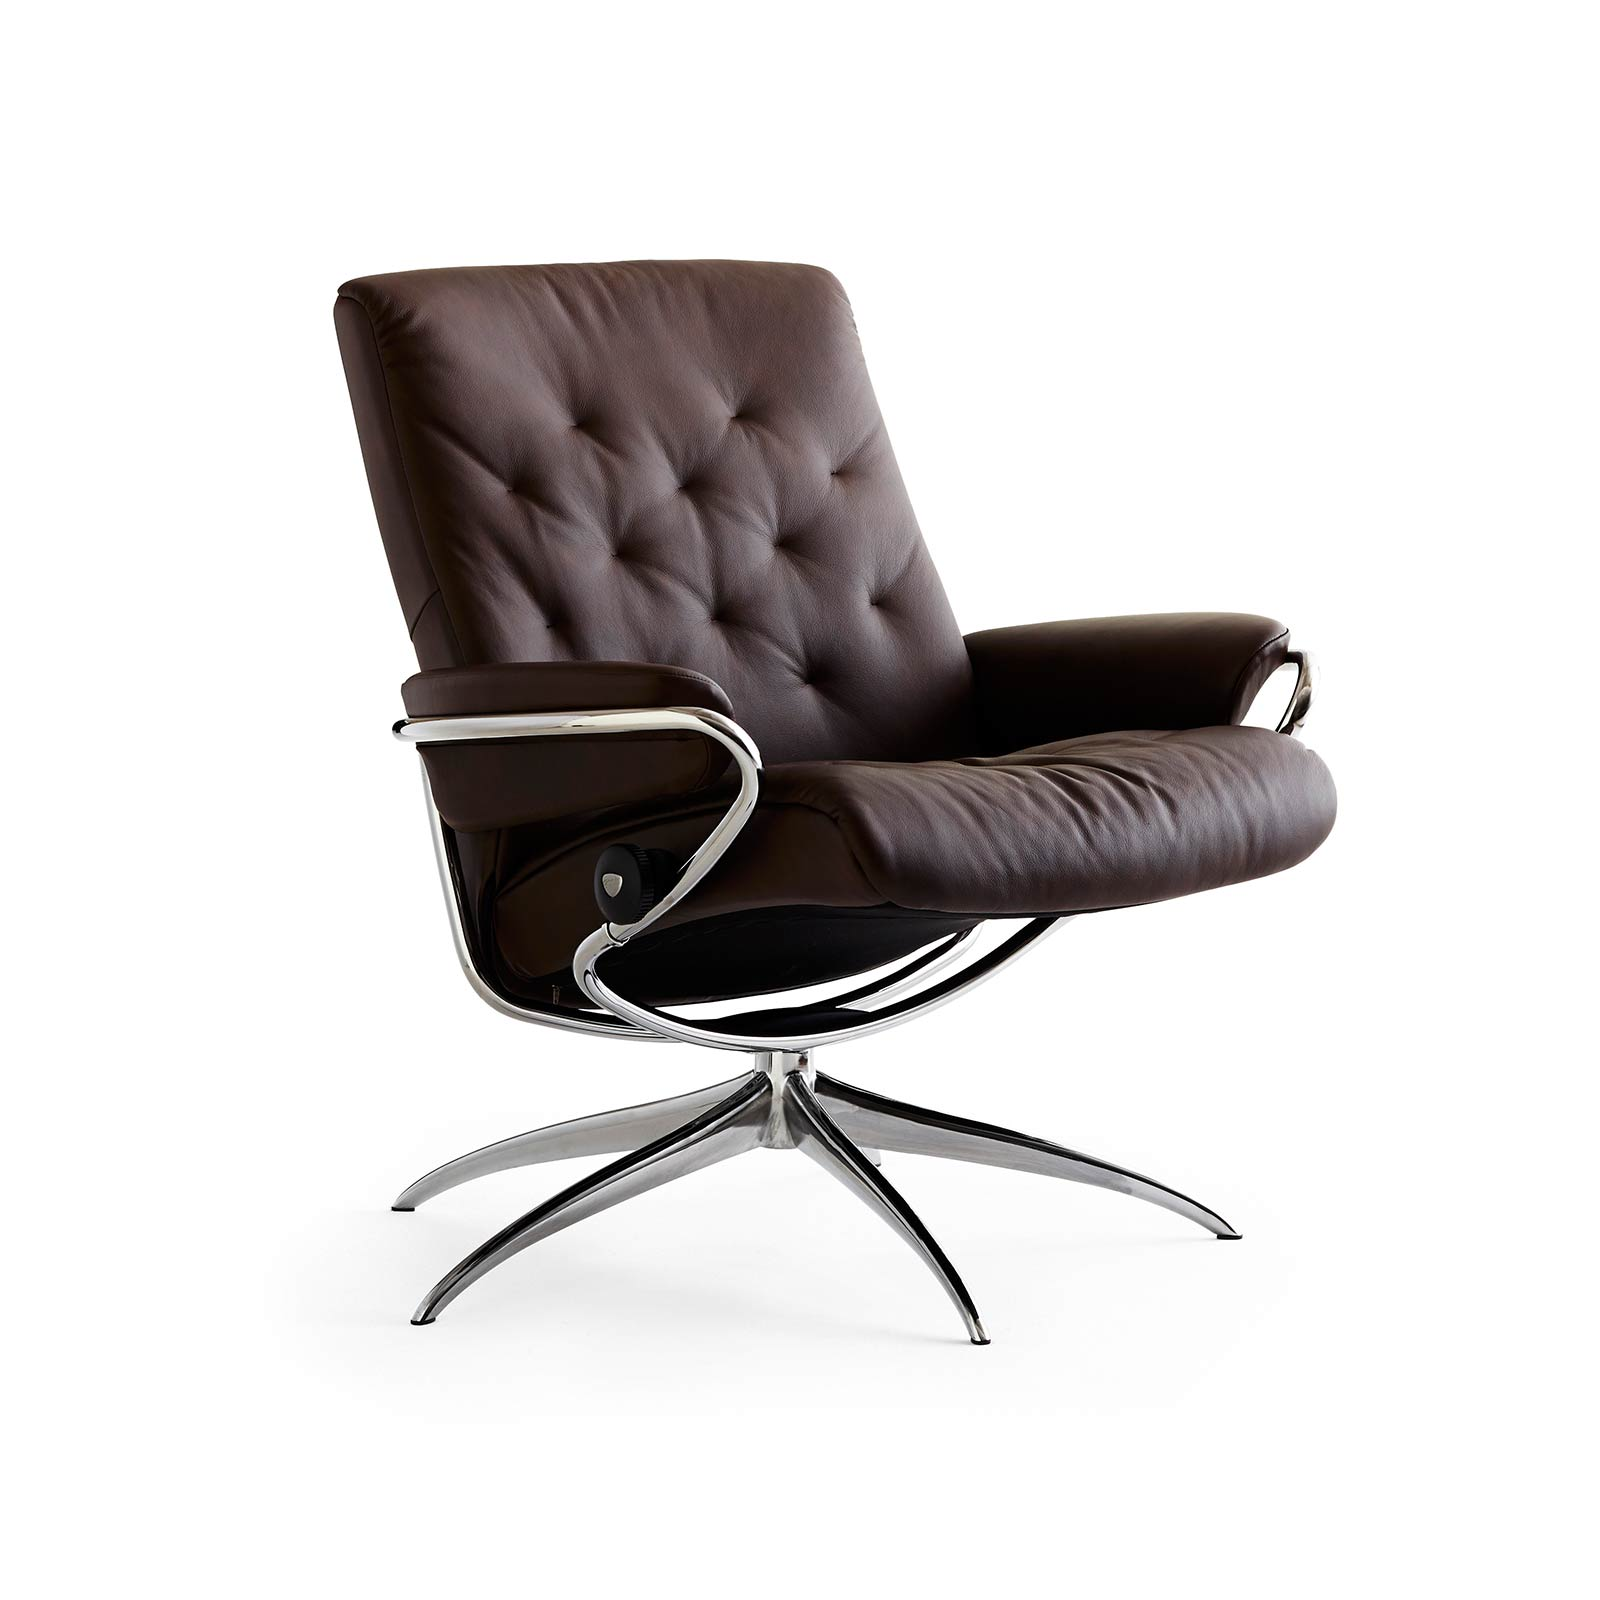 stressless sessel metro low back paloma braun stressless. Black Bedroom Furniture Sets. Home Design Ideas